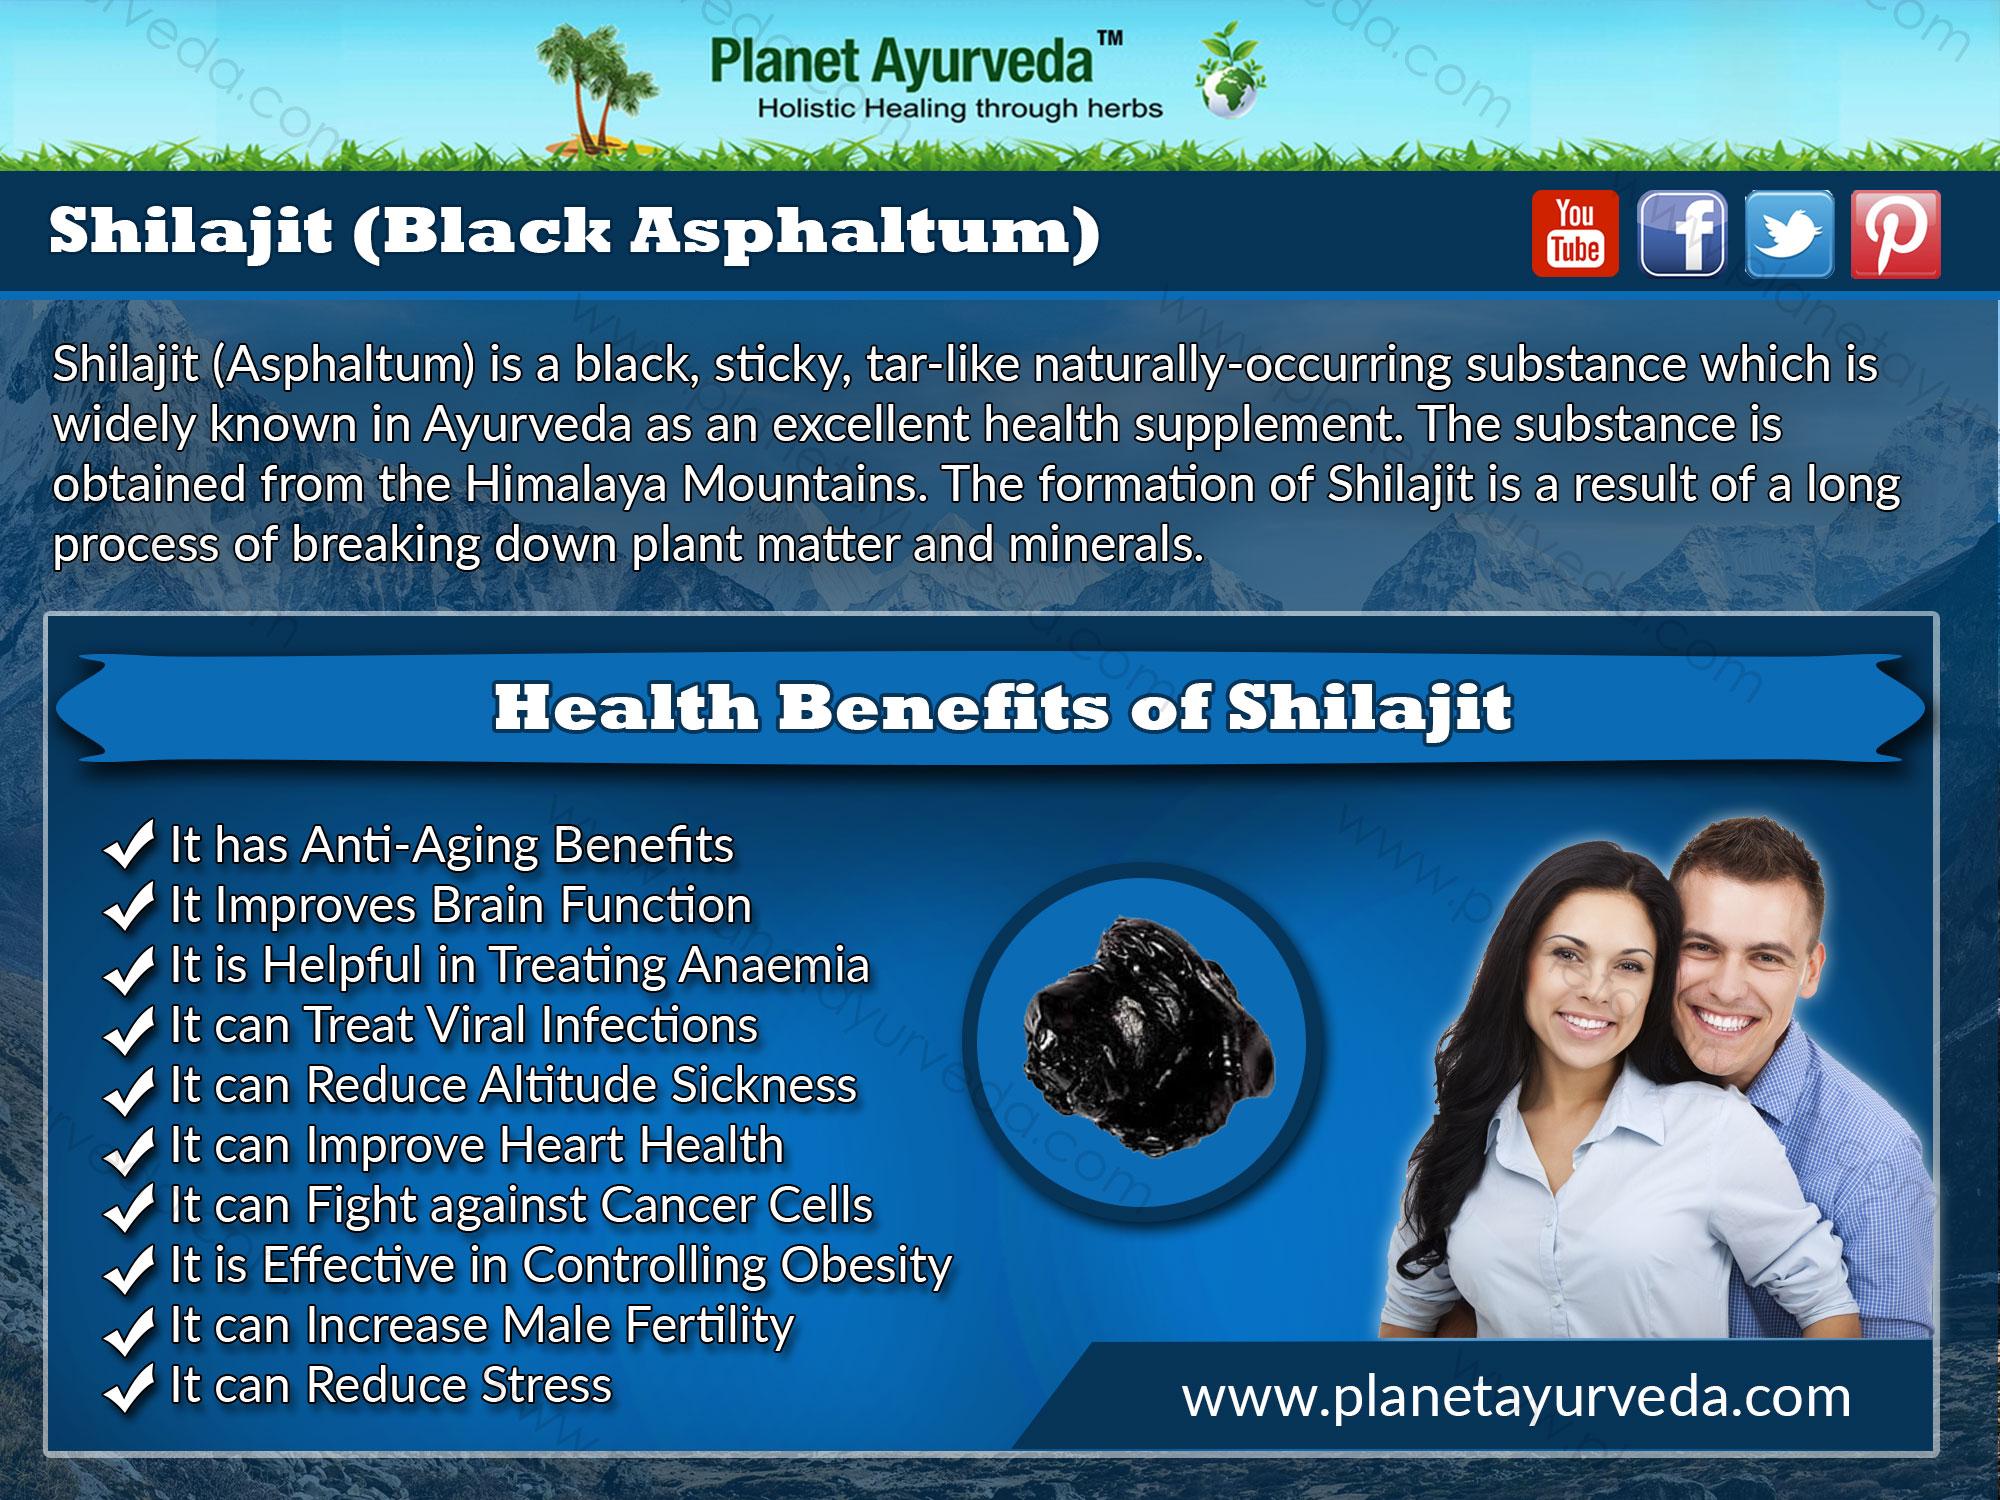 shilajit-&-Benefits